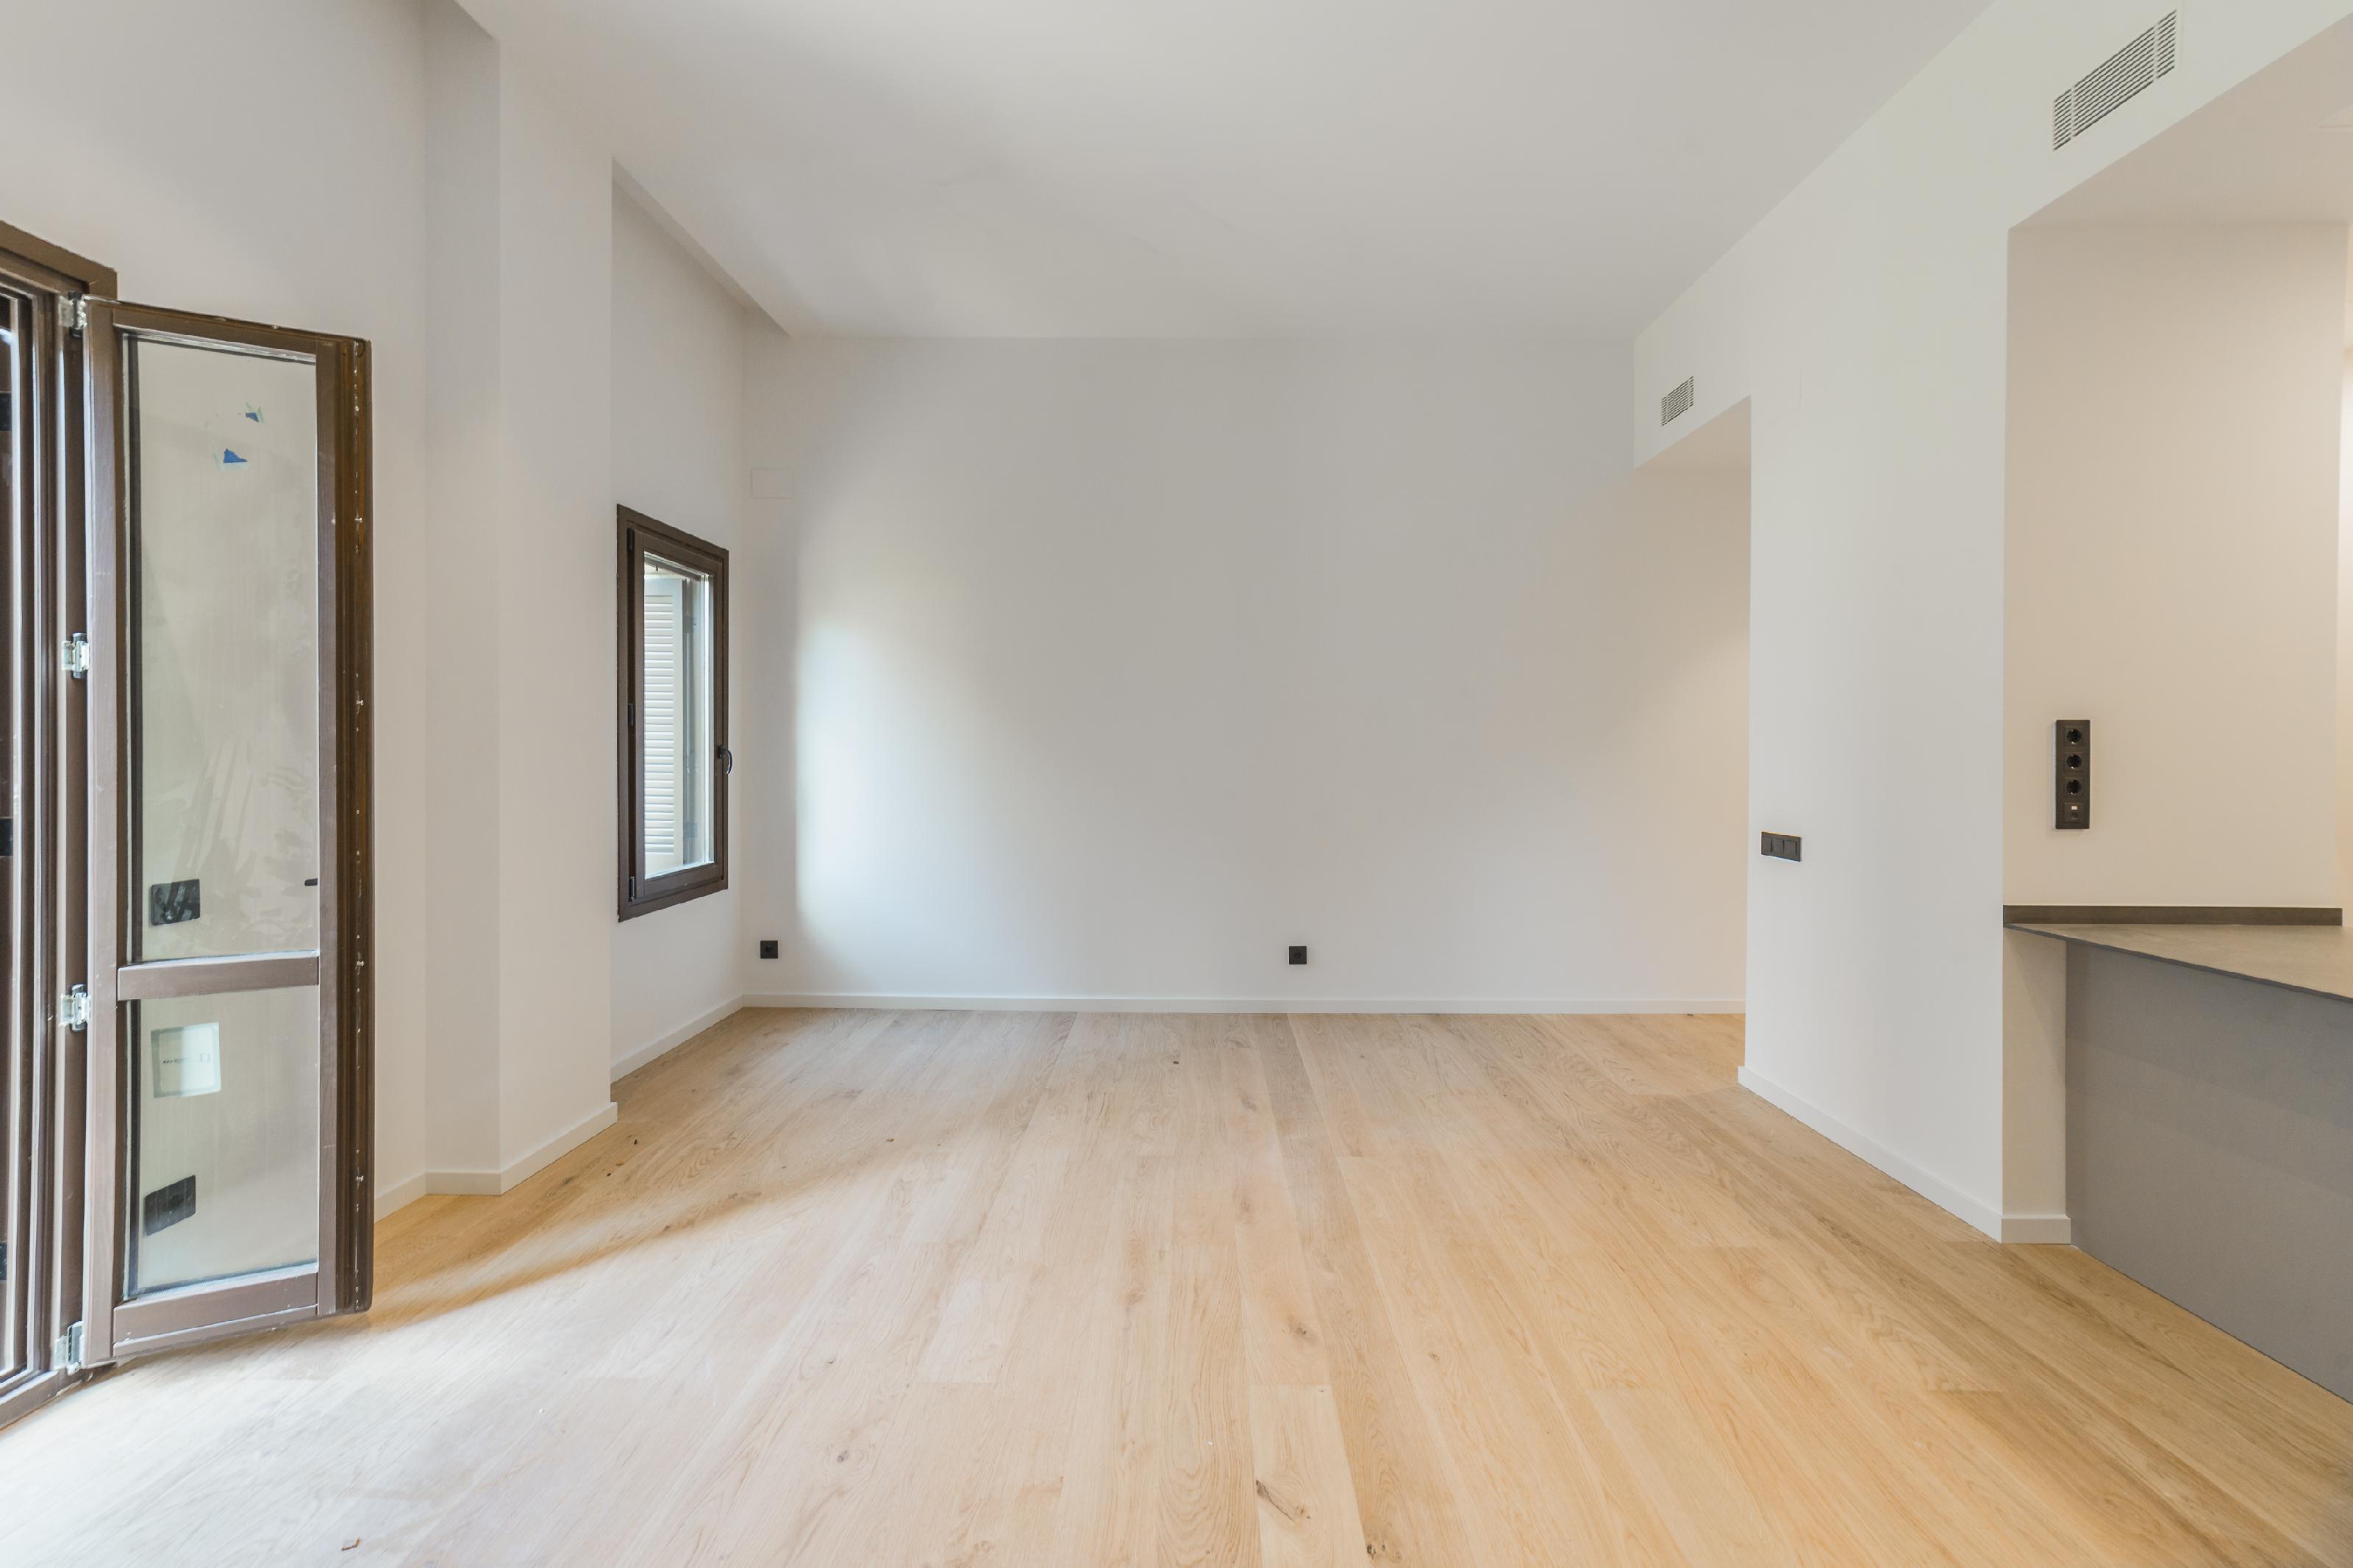 182456 Apartamento en venda en Eixample, Antiga Esquerre Eixample 8